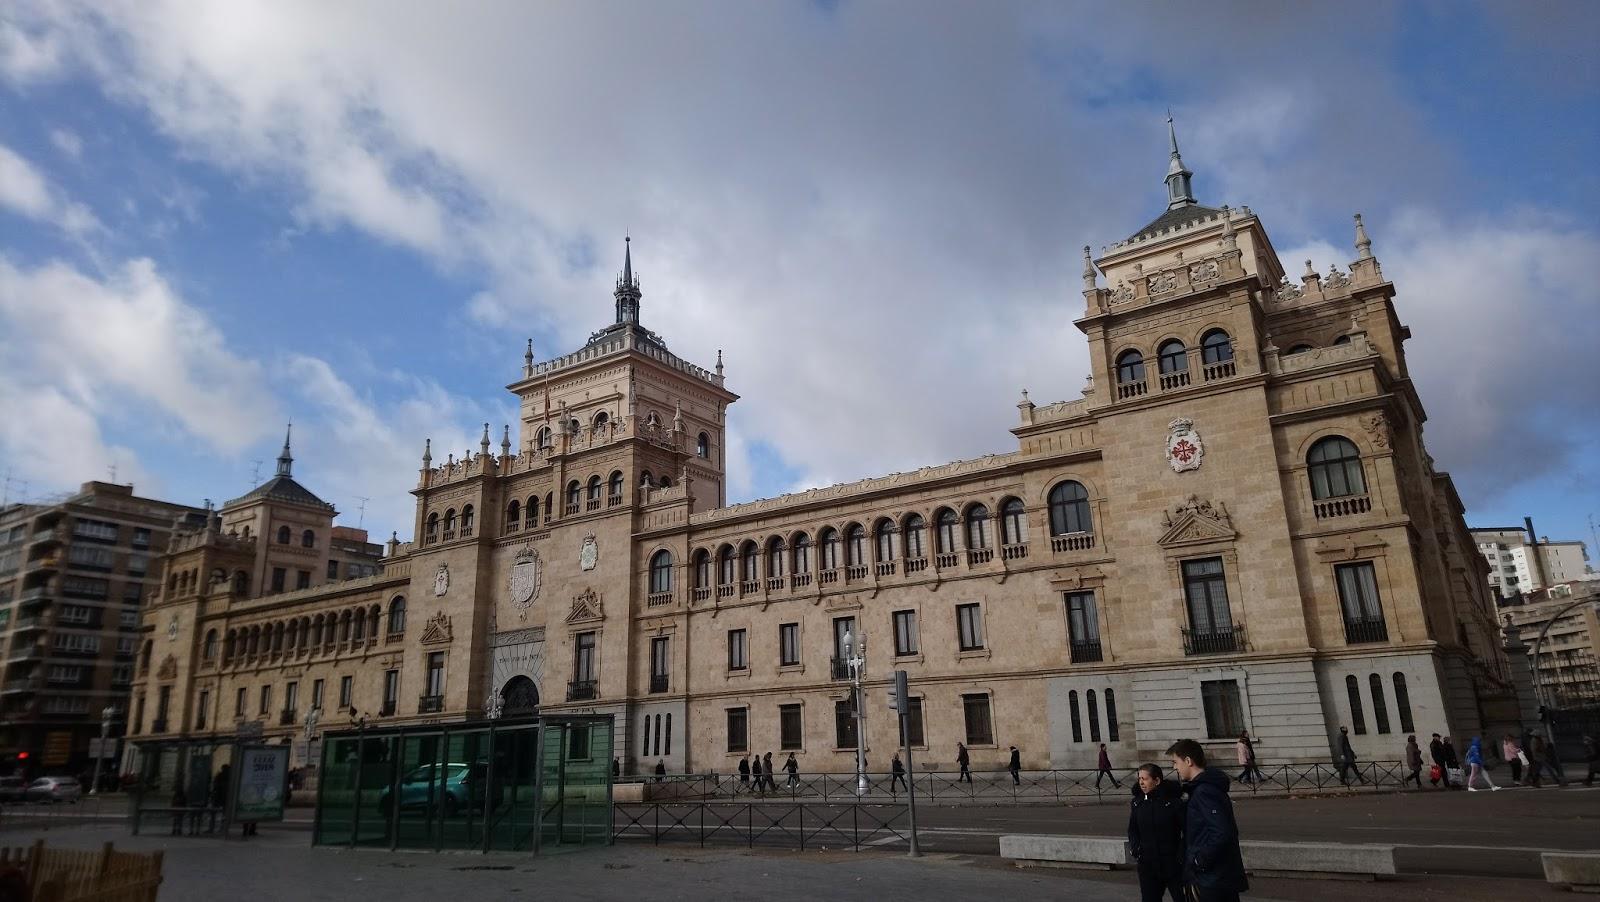 Edificio frente al Parque Campo Grande